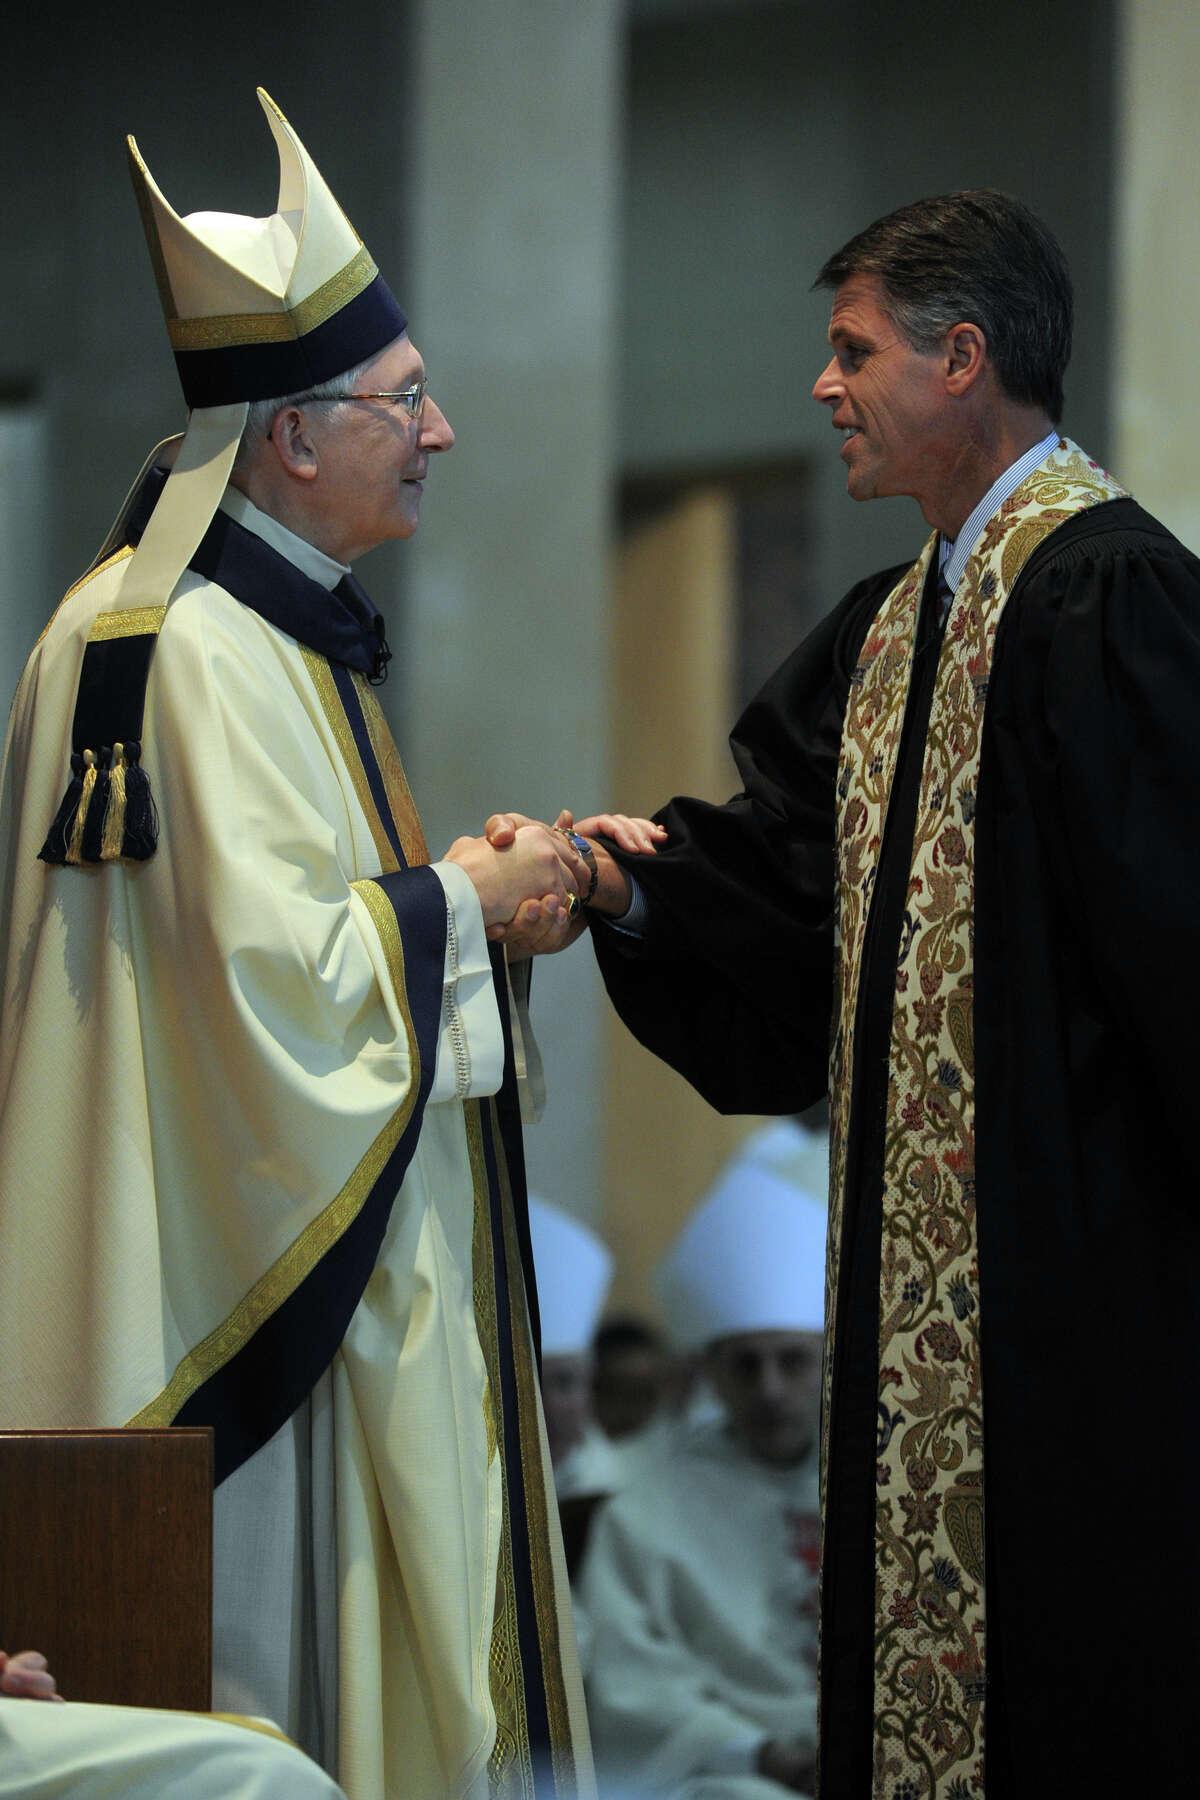 Mass of Installation for Archbishop Leonard P. Blair, Cathedral of Saint Joseph in Hartford, Conn., Dec. 16, 2013.